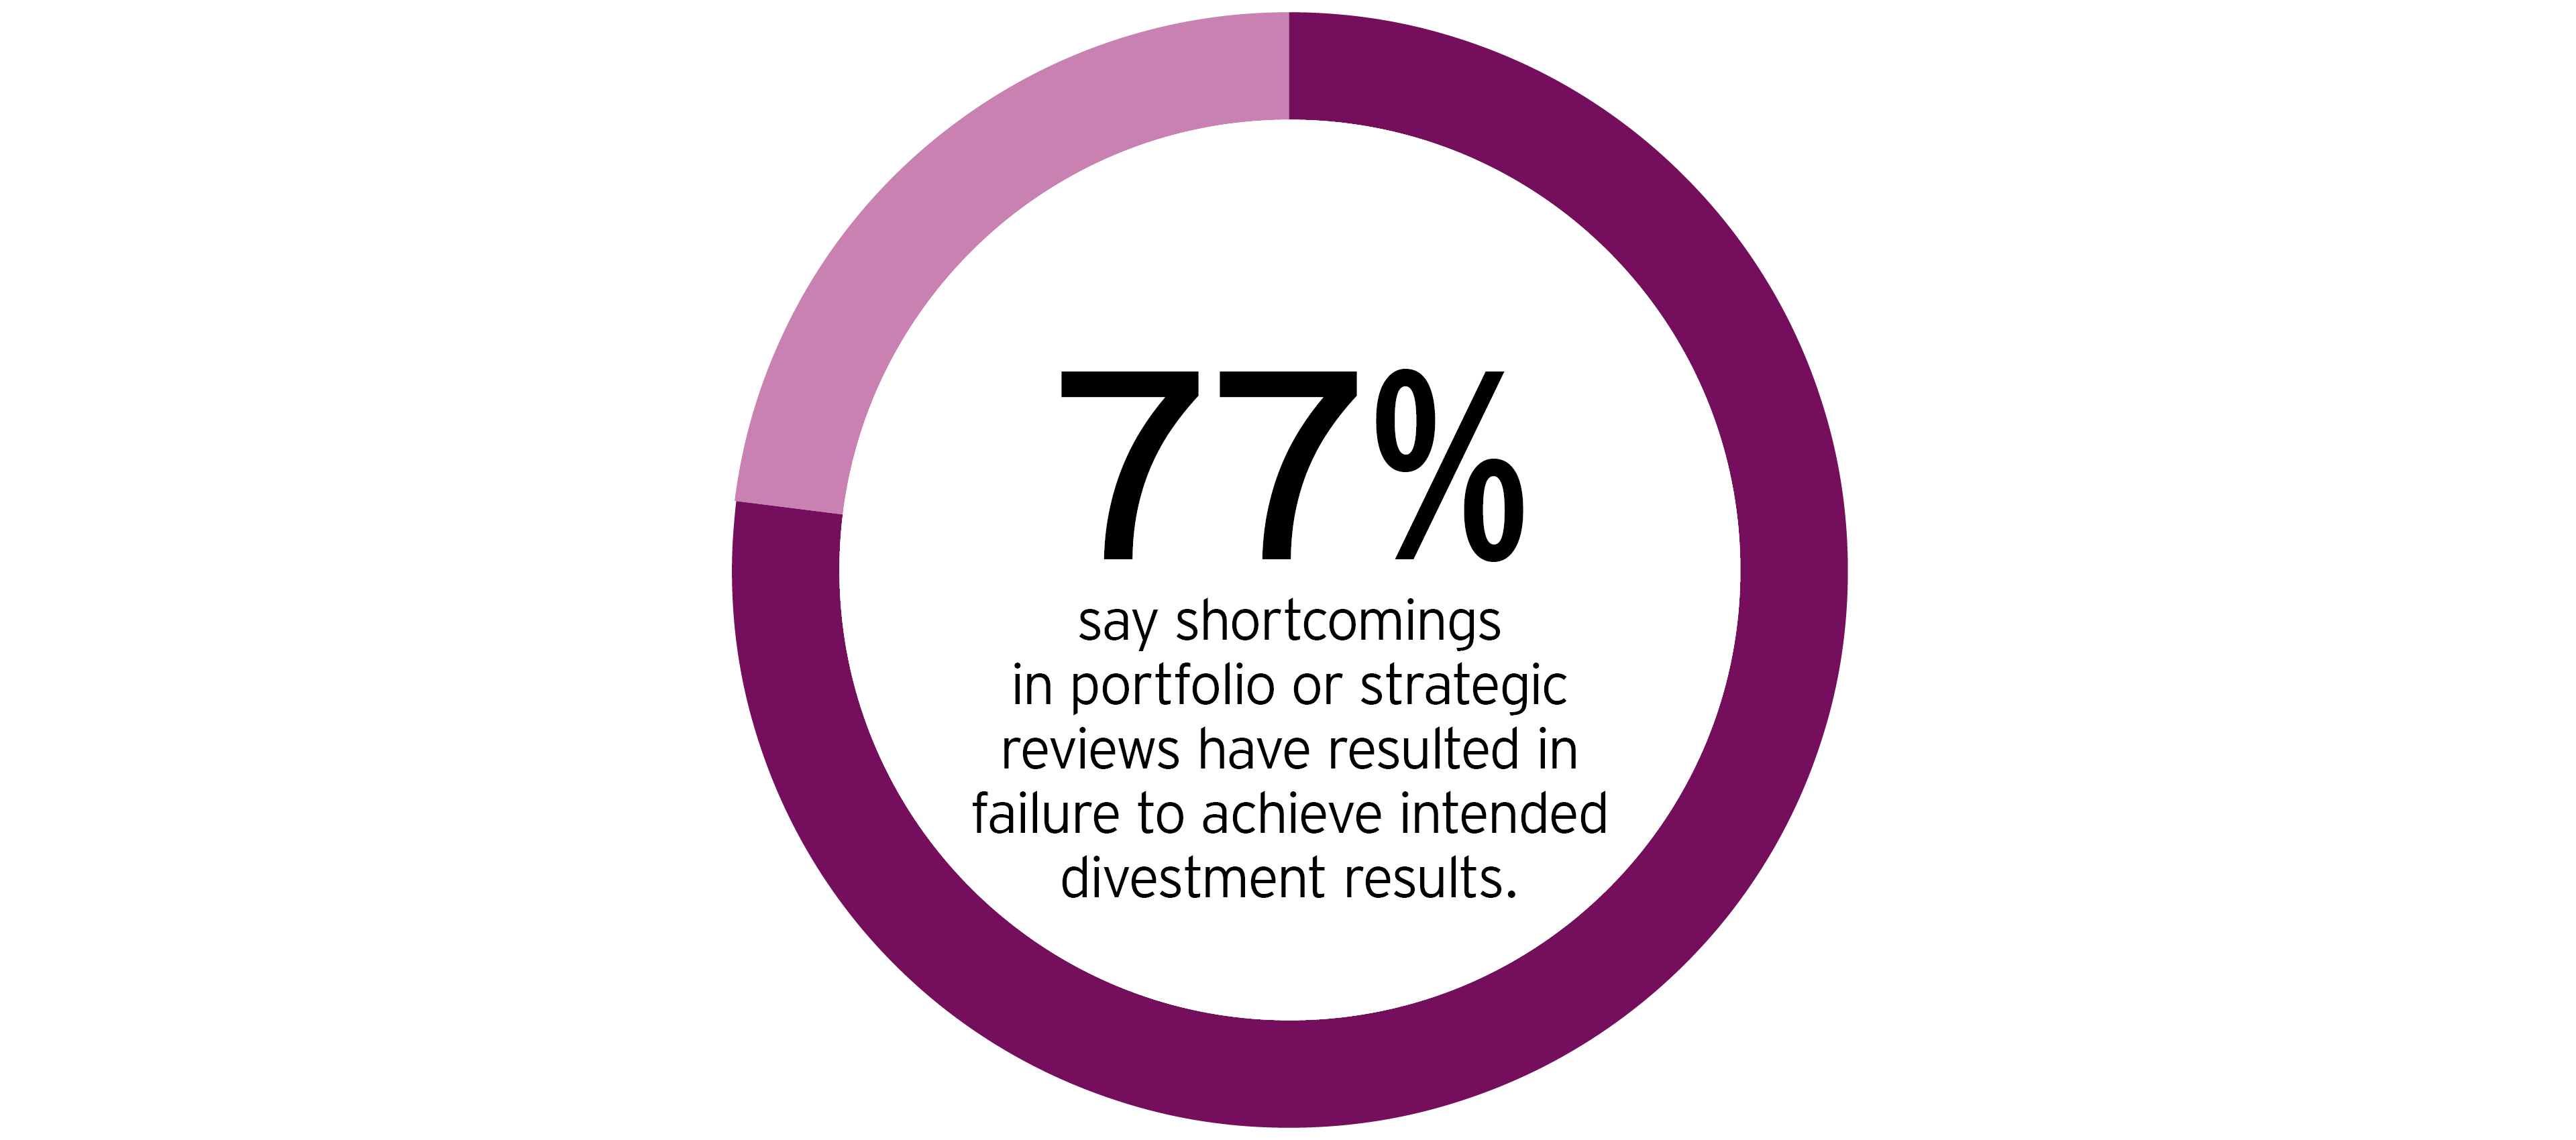 77% say shortcomings in portfolio